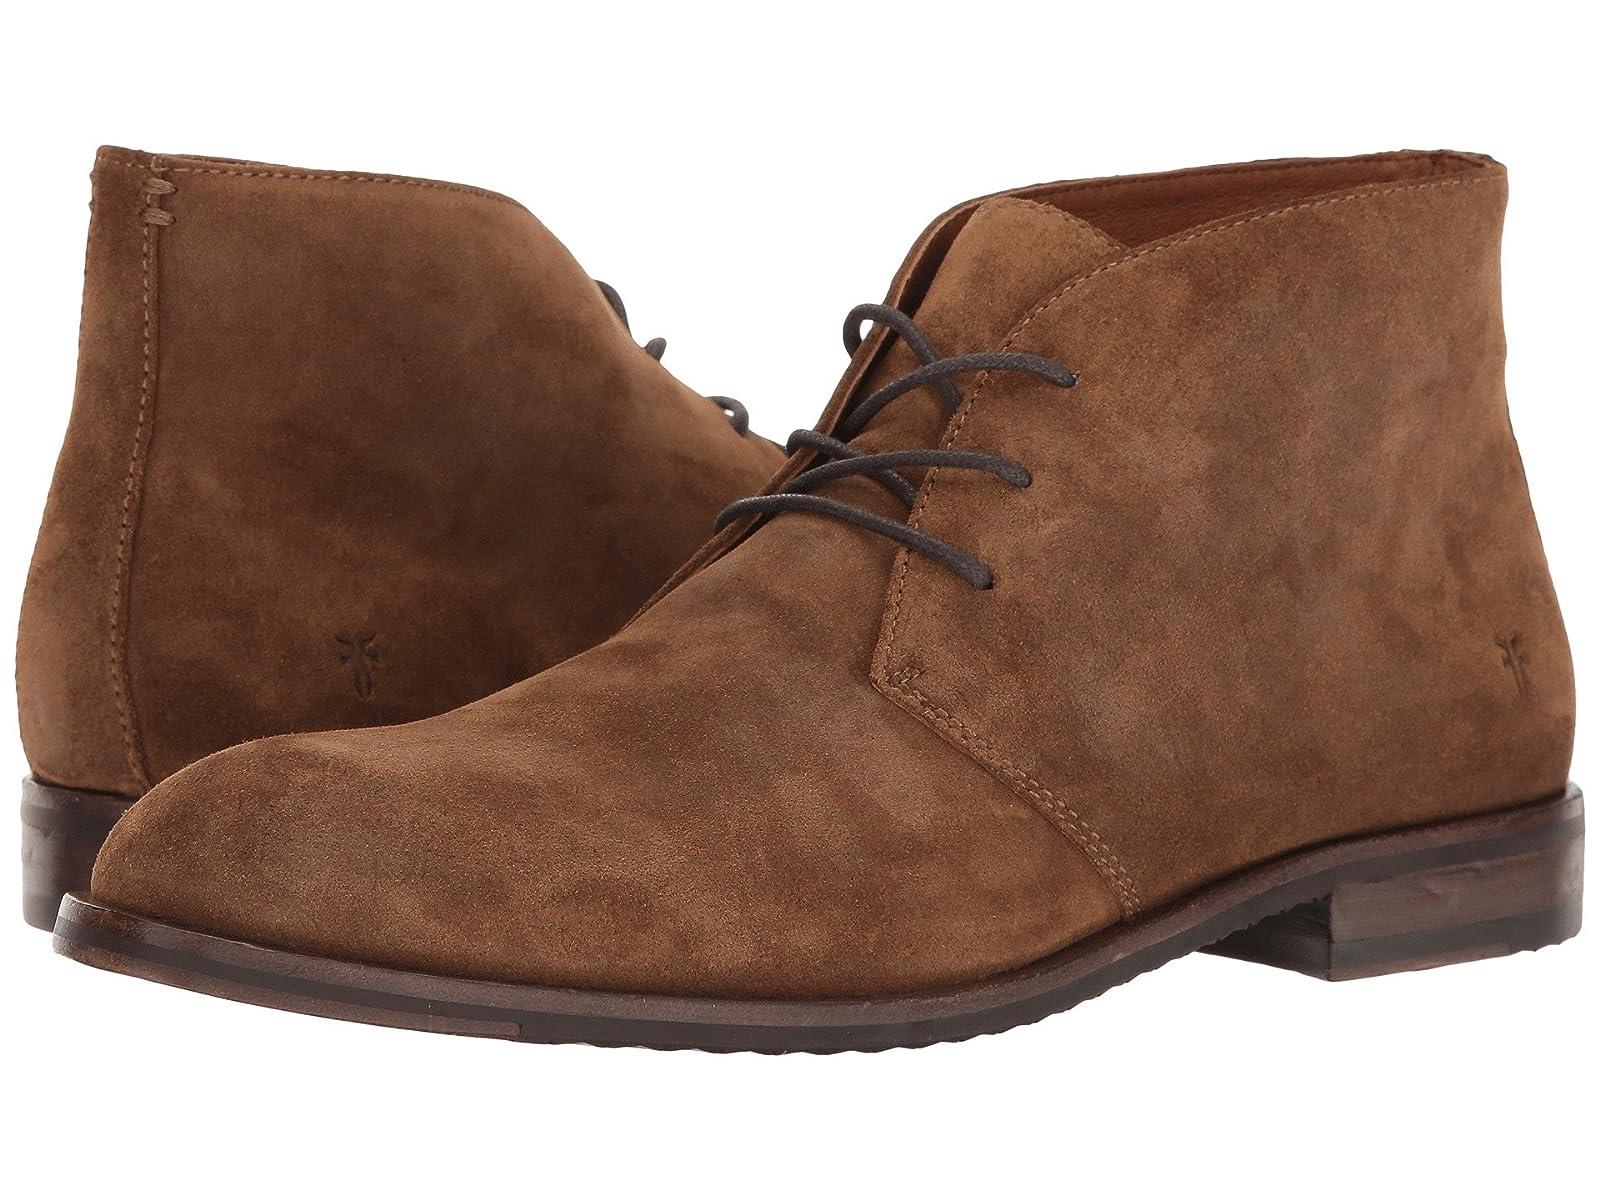 Frye Sam ChukkaCheap and distinctive eye-catching shoes